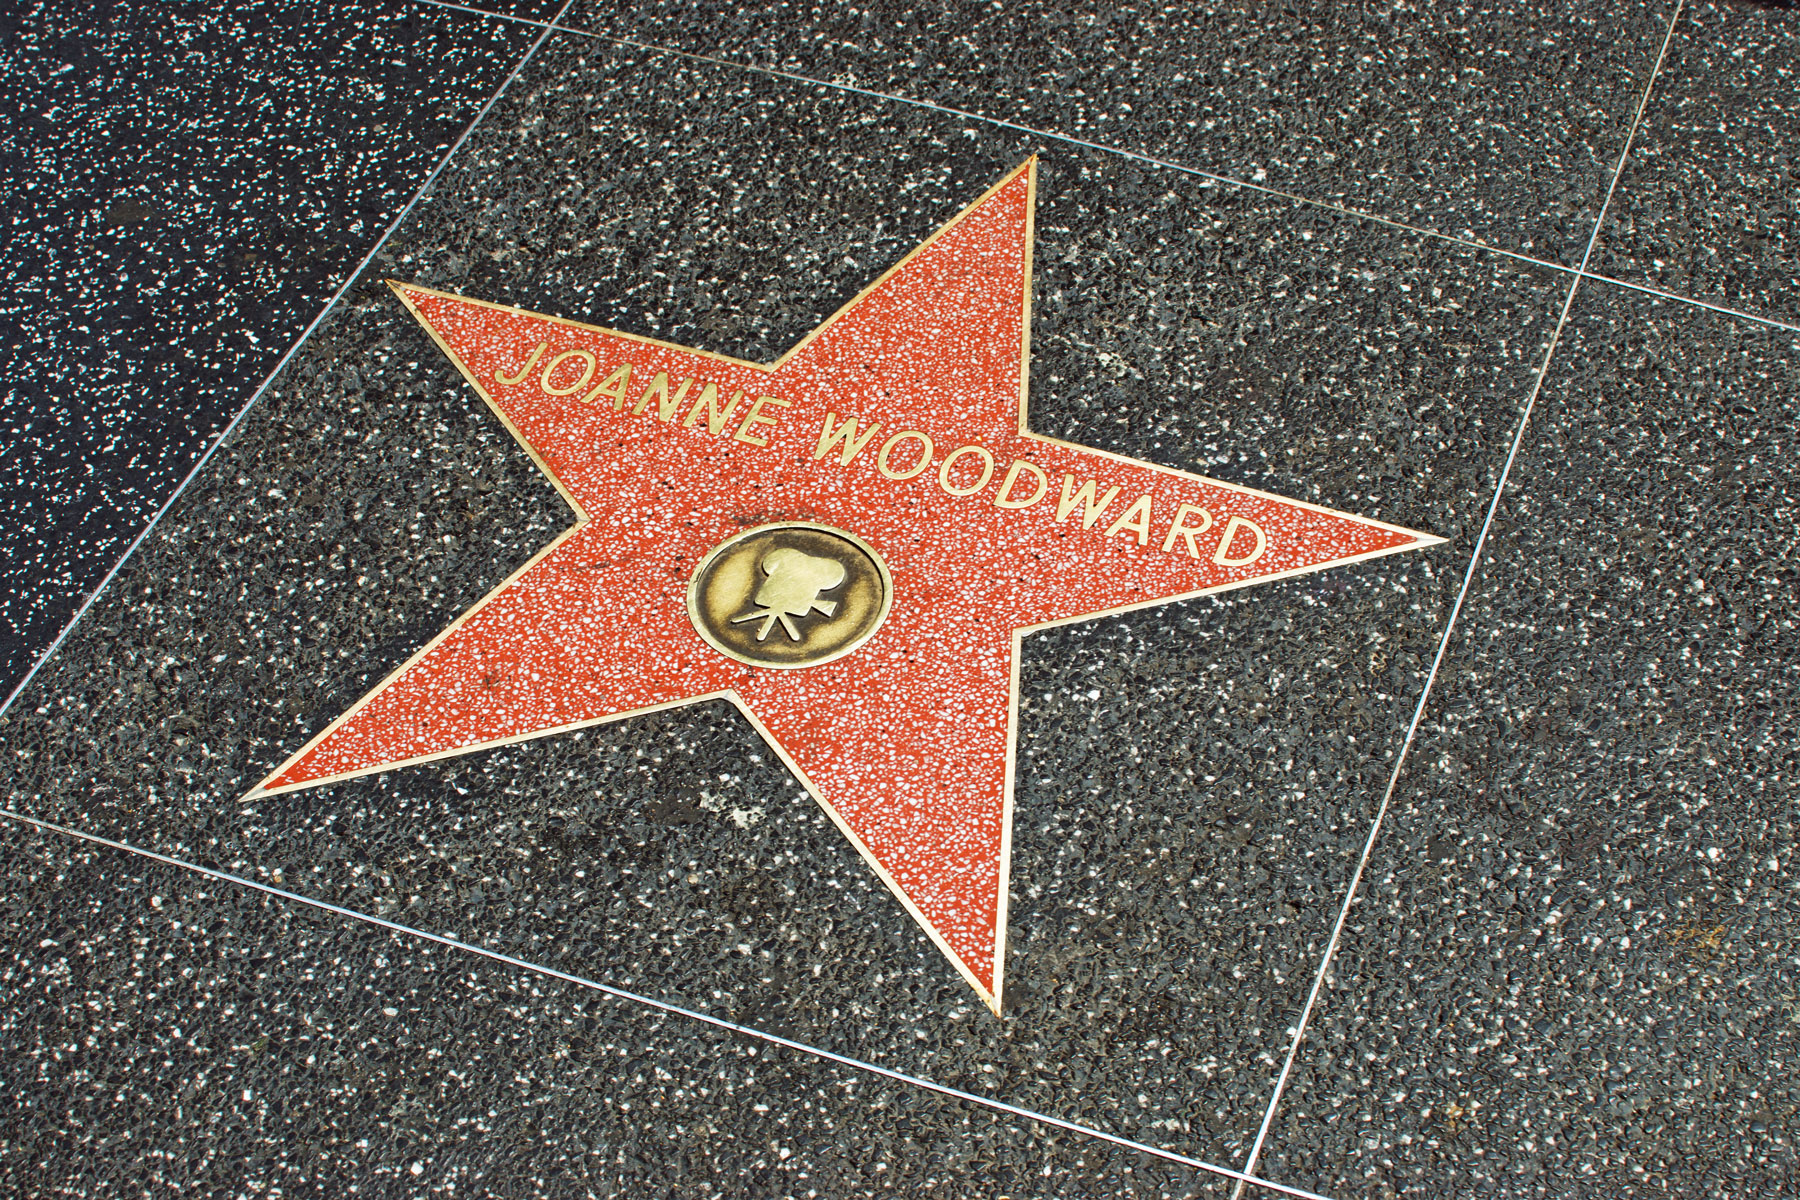 Звезда наАллее славы американской актрисы Джоан Вудворд, 2014 год.Звезда наАллее славы американской актрисы Джоан Вудворд, 2014 год. Вудворд была вчисле восьми деятелей кино, получивших звезду набульваре Голливуд (однако первые памятные знаки были временными — первую постоянную звезду получил режиссер Стэнли Крамер)oanne Woodward star on Hollywood Walk of Fame in Hollywood, California. This star is located on Hollywood Blvd. and is one of over 2000 celebrity stars embedded in the sidewalk. It was one of the first 8 inaugural stars.31 minutes ago